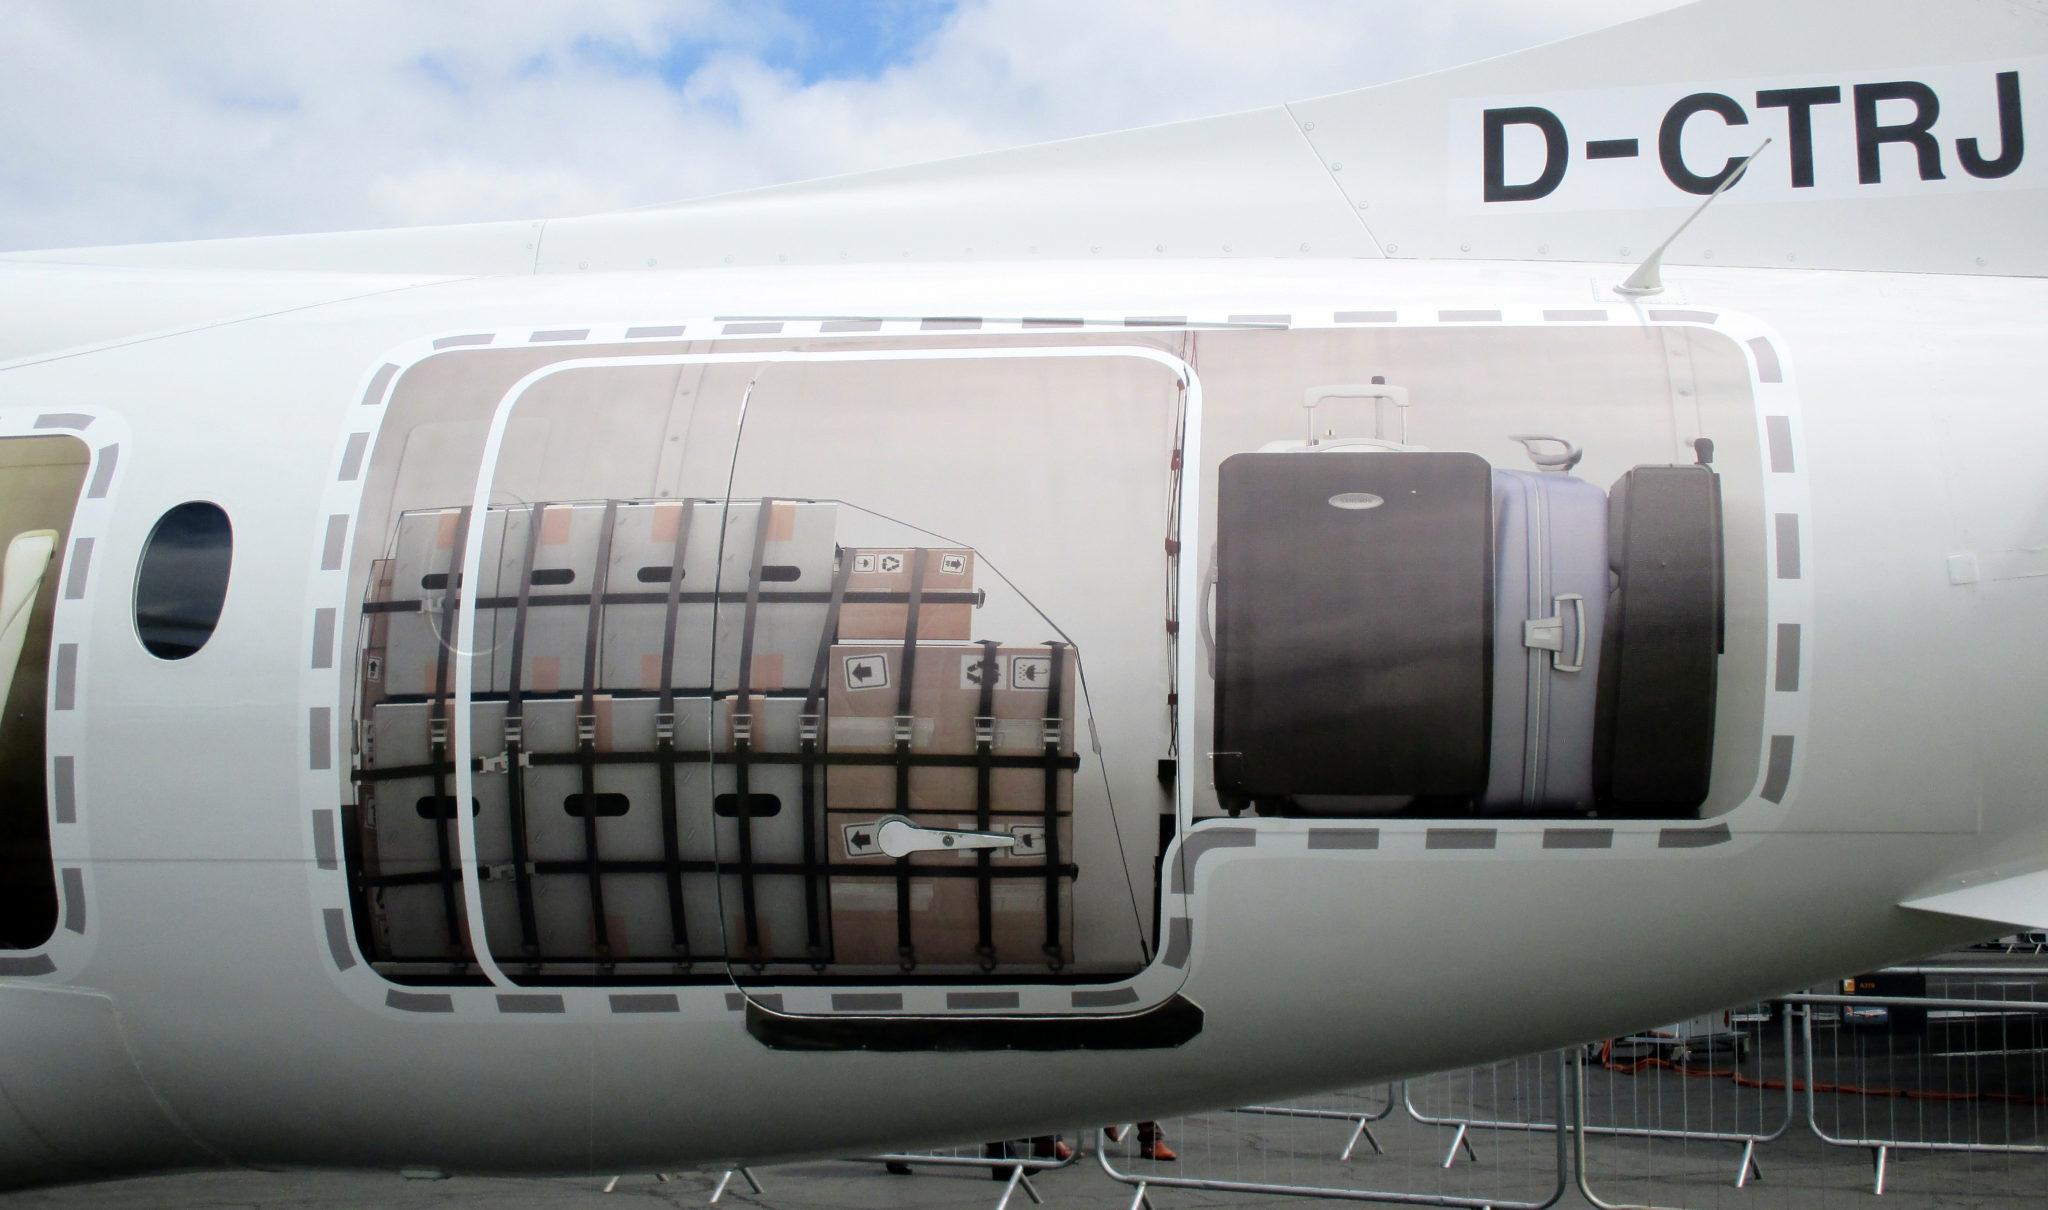 328 cargo